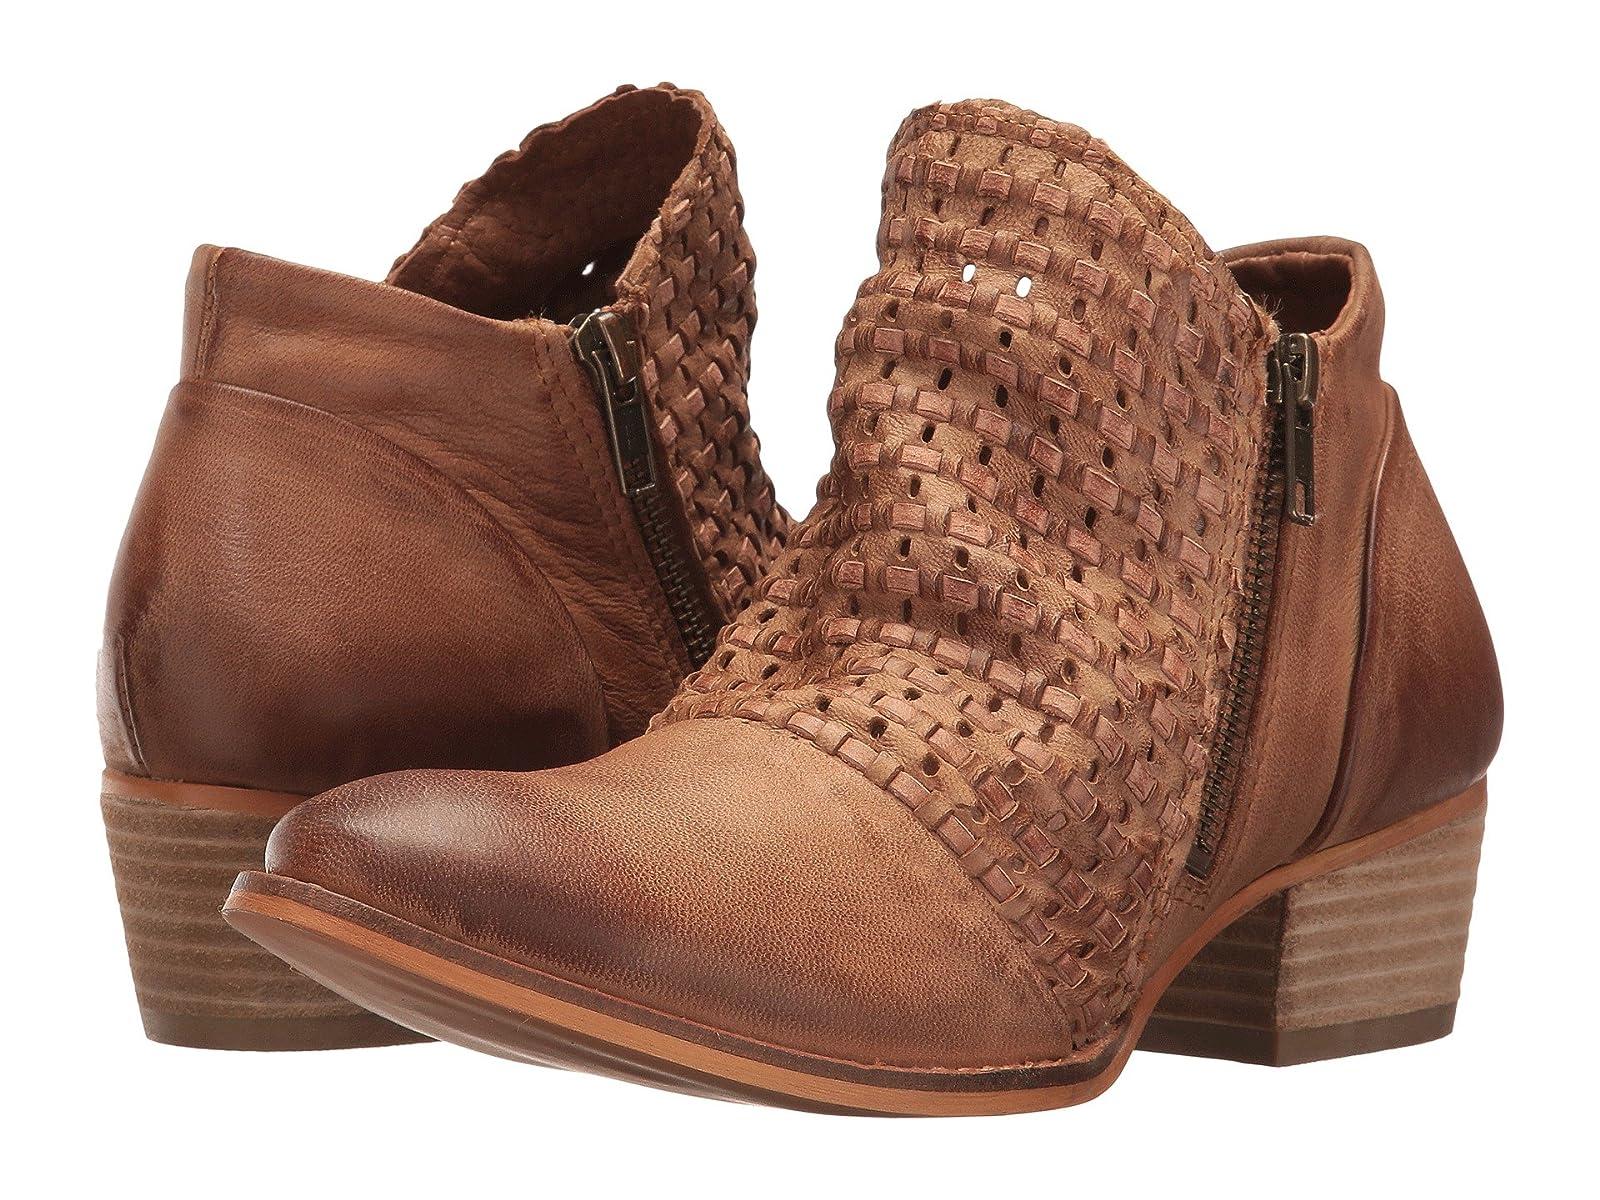 Splendid RaviCheap and distinctive eye-catching shoes